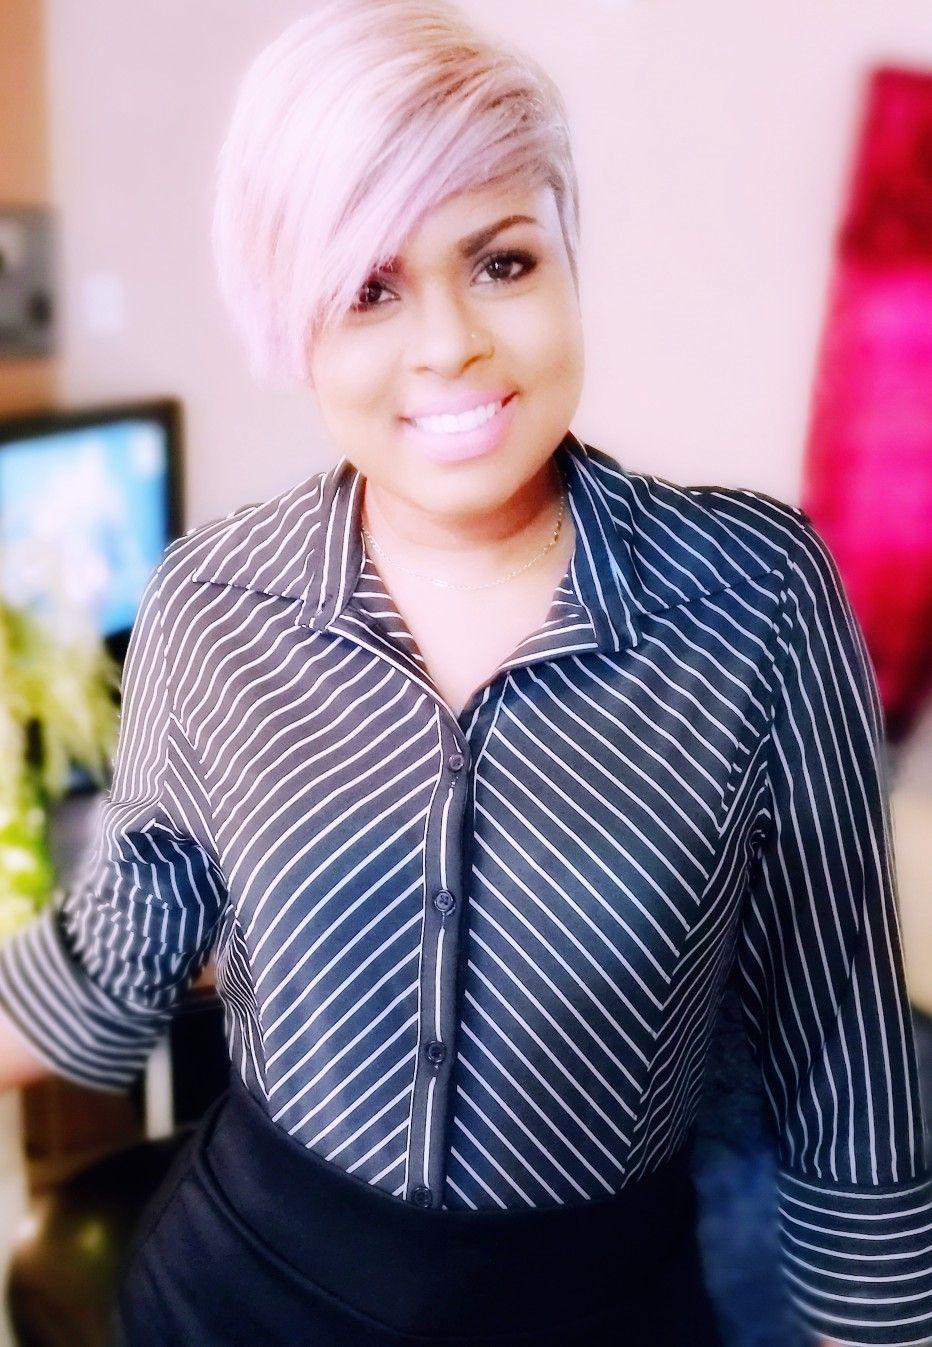 Tobago got swag ash platinum blonde hair with purple hues ra